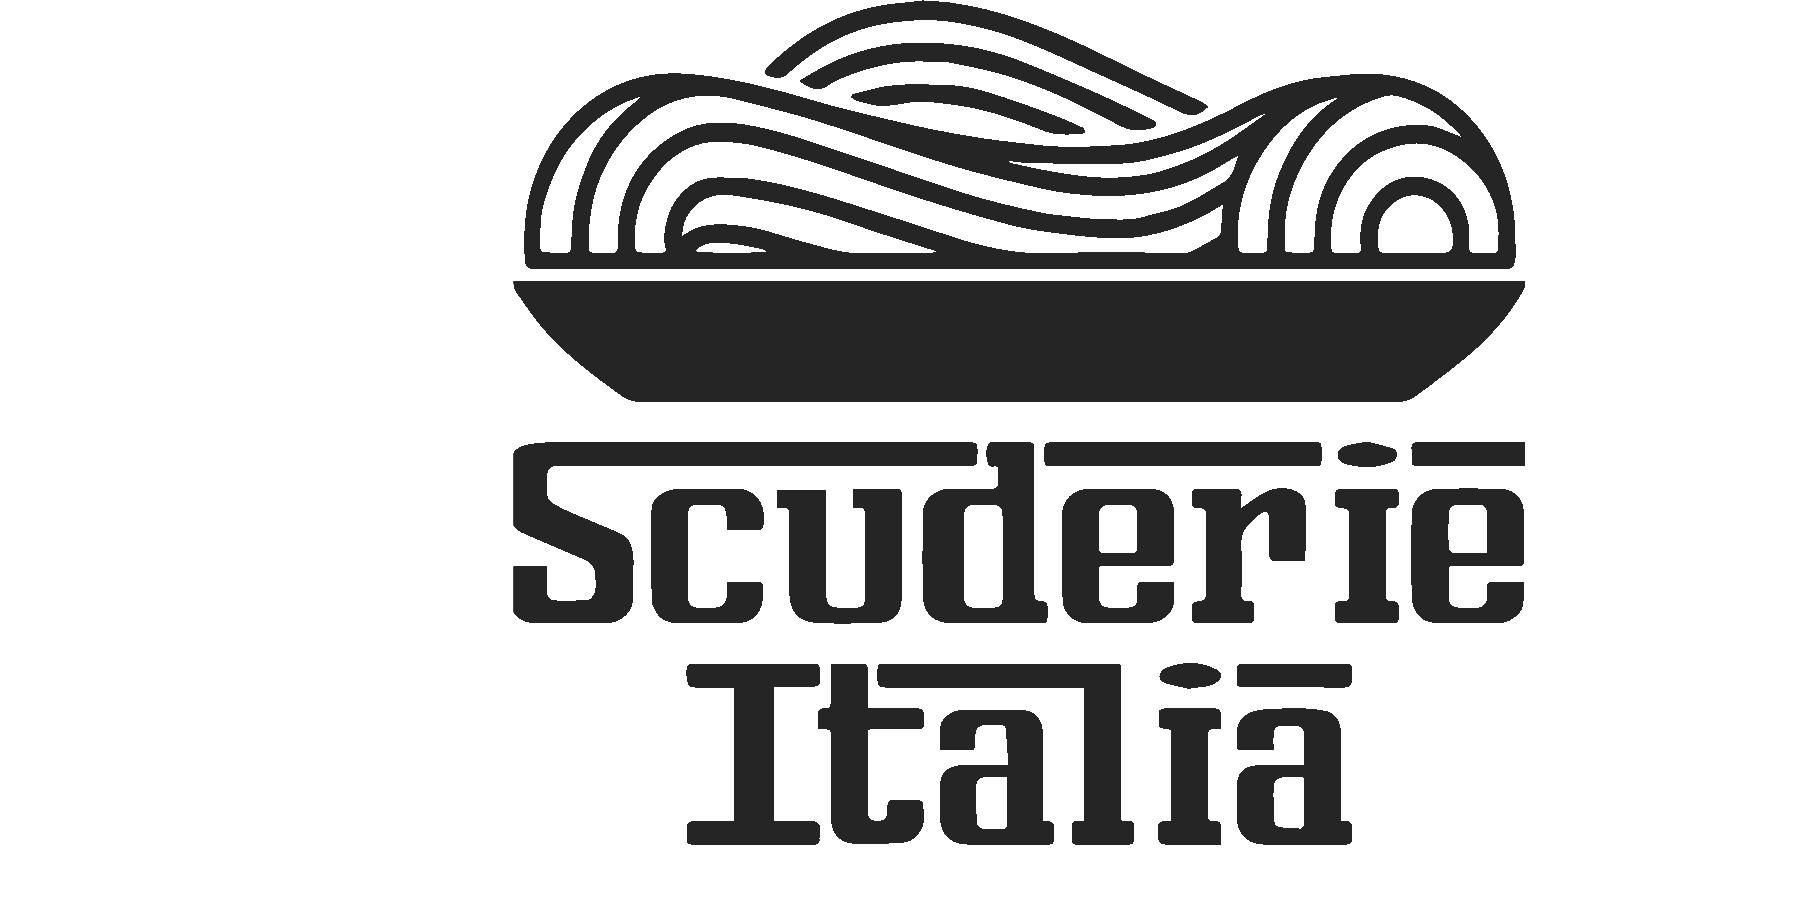 Pacific Beach Italian Restaurant